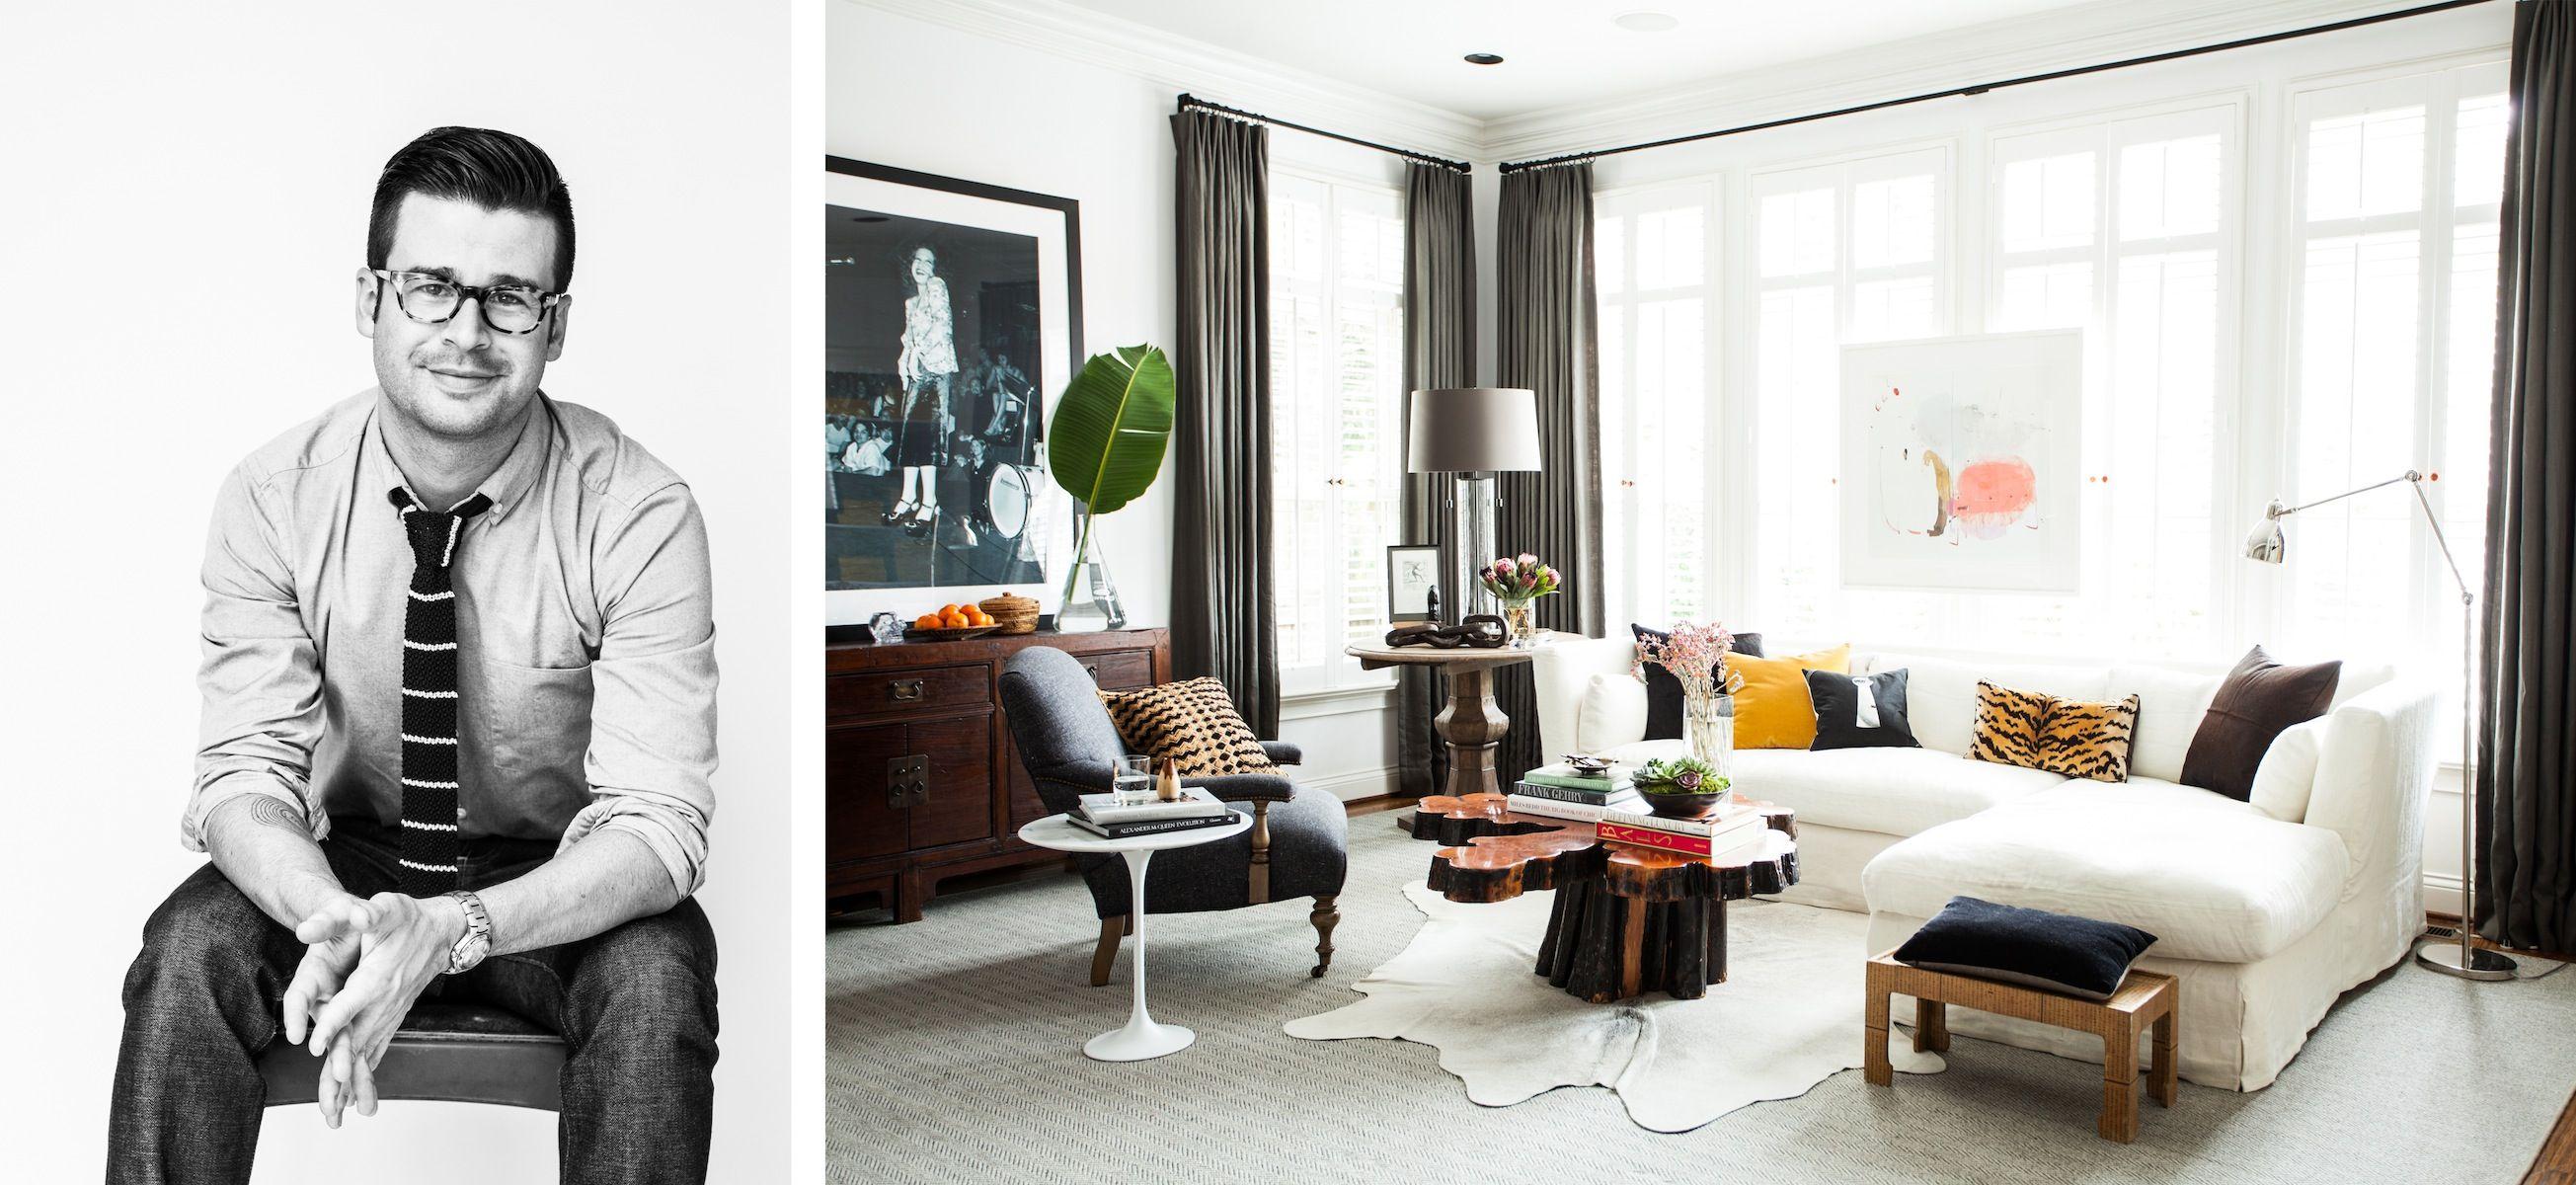 Nashville-based Benjamin Vandiver has an urbane, elegant approach to ...